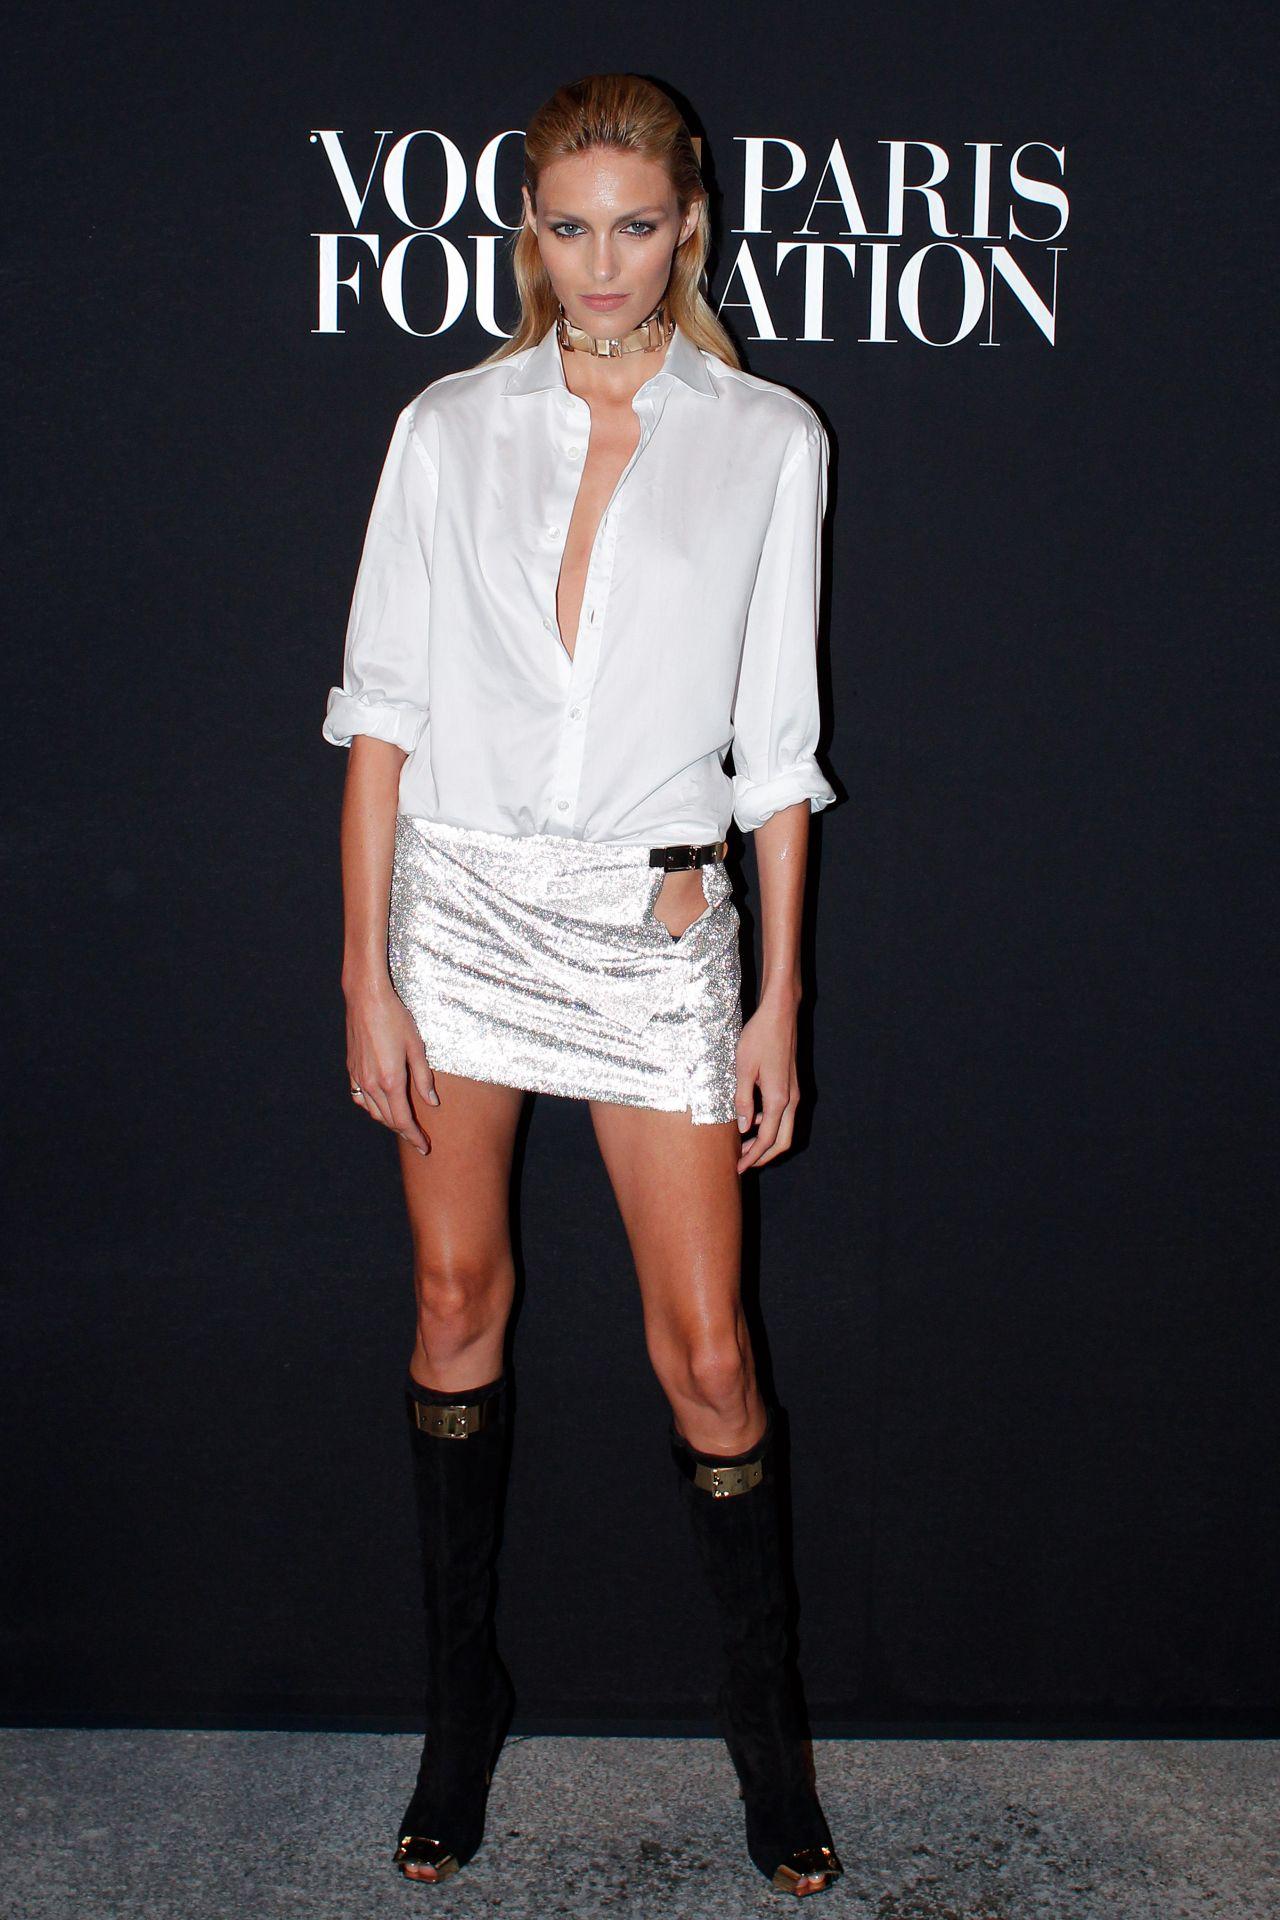 Anja Rubik at Vogue Foundation Gala - July 2014